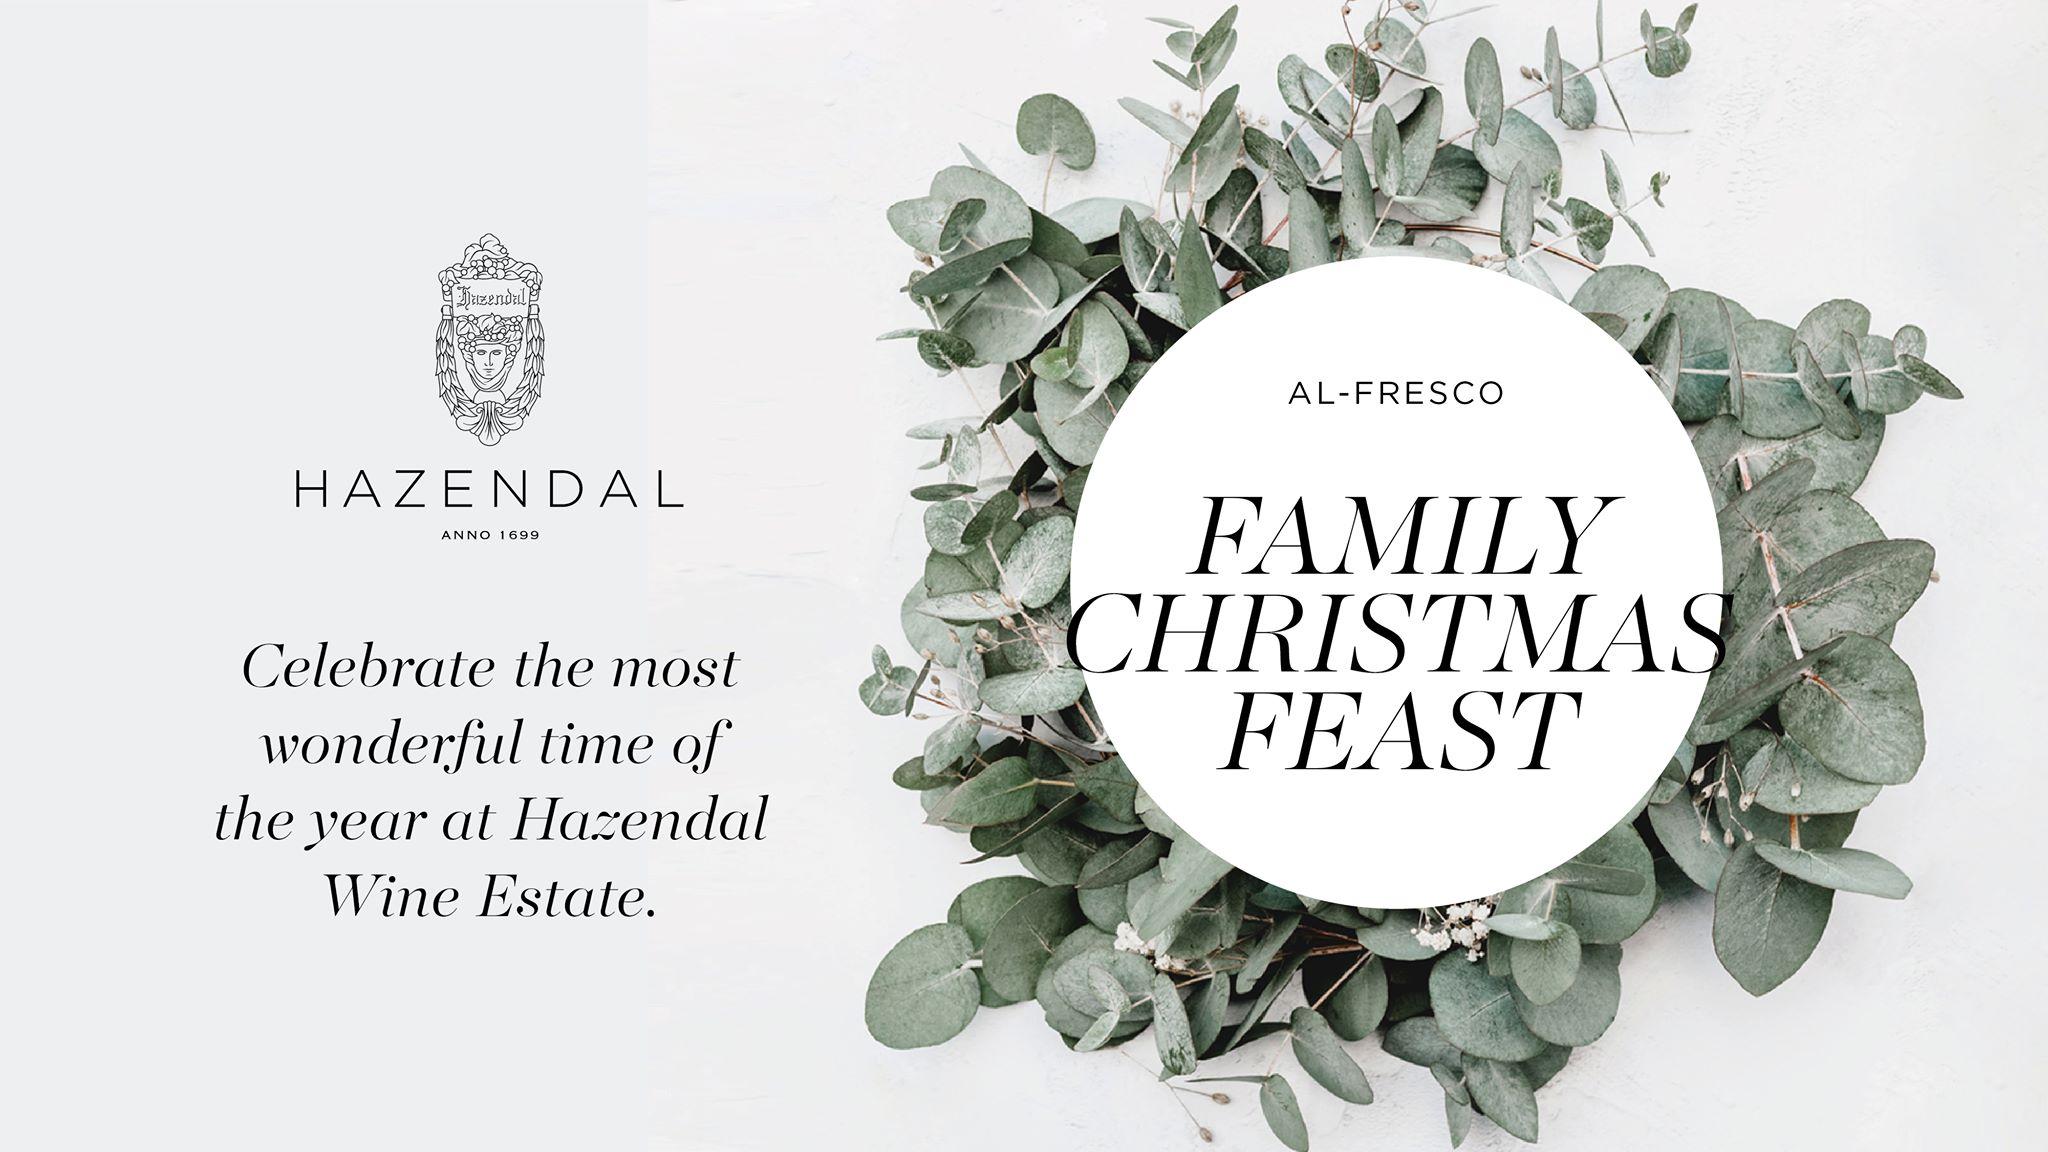 Hazendal Christmas Family Feast